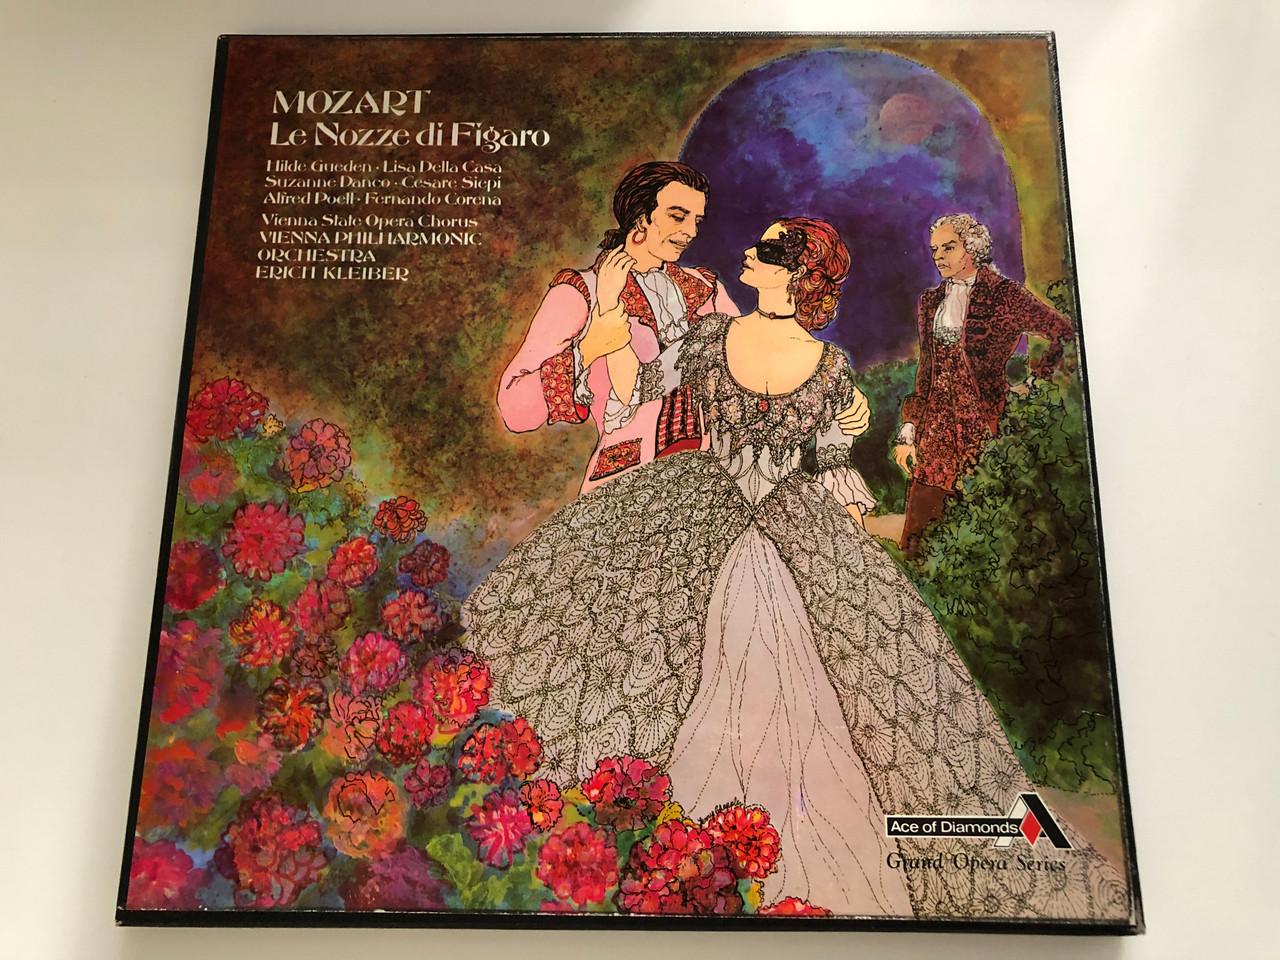 https://cdn10.bigcommerce.com/s-62bdpkt7pb/products/29558/images/176206/Mozart_-_Le_Nozze_Di_Figaro_Hilde_Gueden_Lisa_Della_Casa_Suzanne_Danco_Cesare_Siepi_Alfred_Poell_Fernando_Corena_Vienna_State_Opera_Chorus_Vienna_Philharmonic_Orchestra_Erich_Kleiber_1__59394.1619080885.1280.1280.JPG?c=2&_ga=2.217568022.1096102493.1619093308-582803094.1619093308